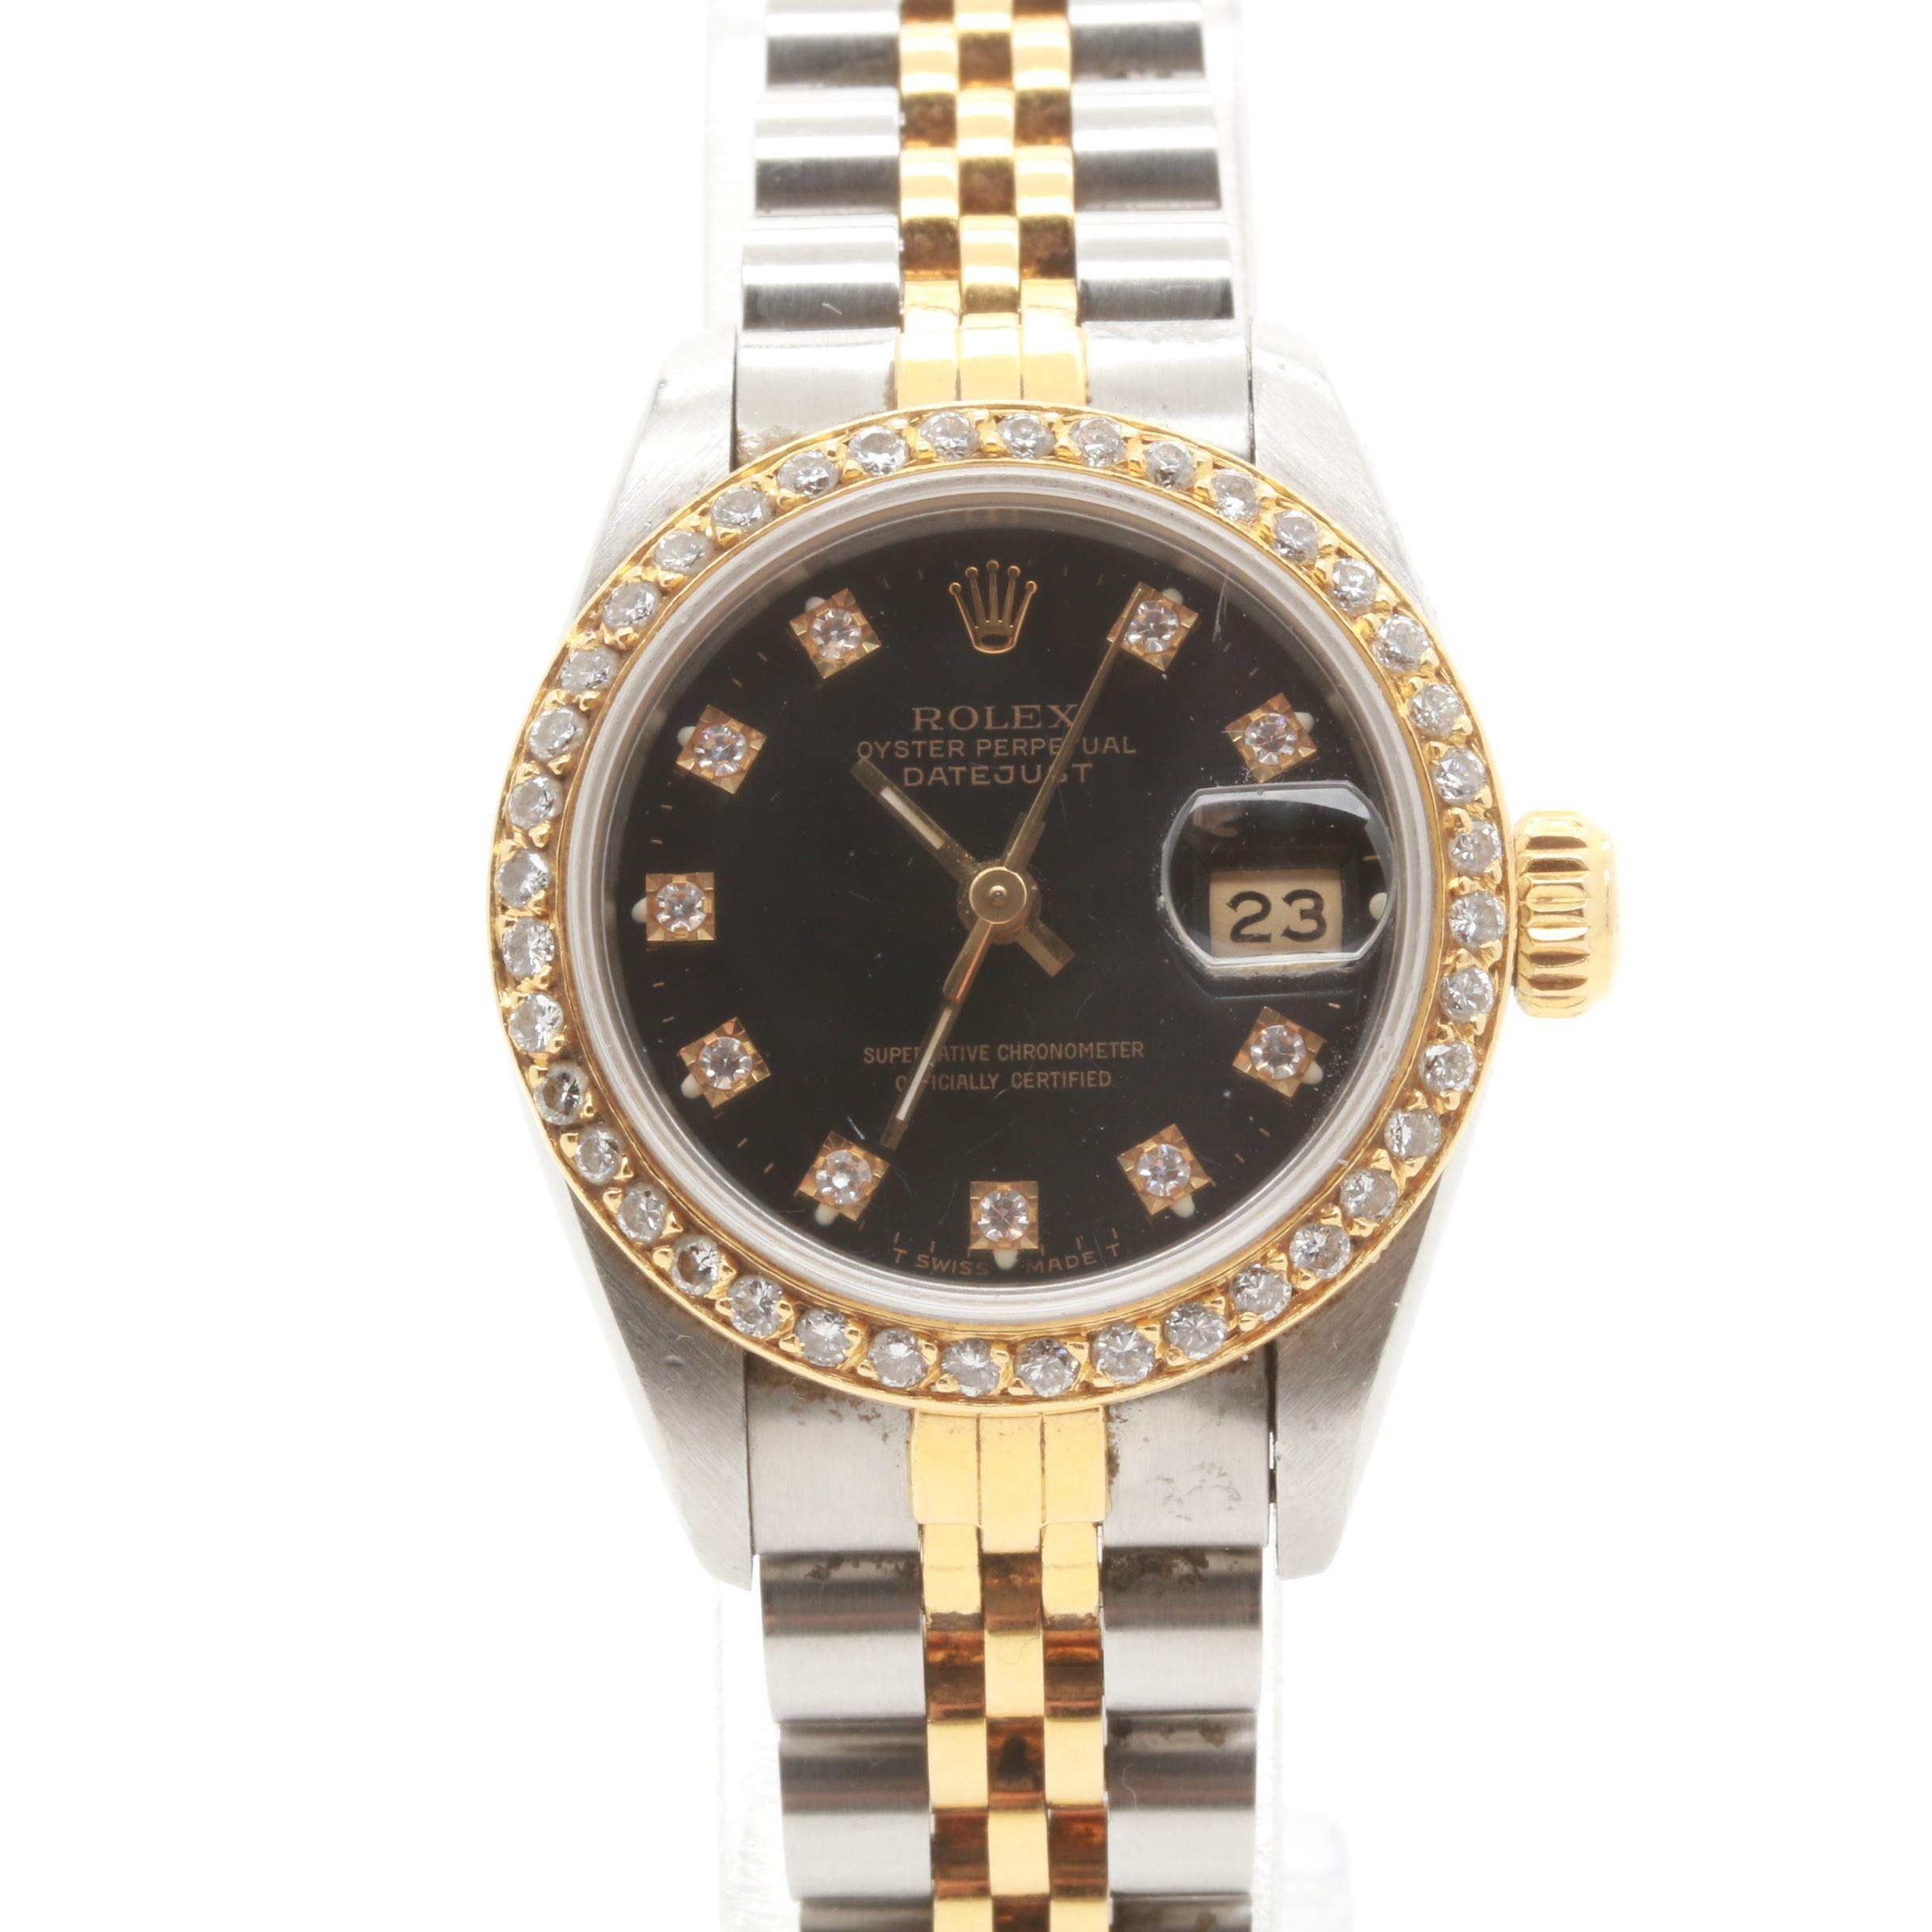 Circa 1990 Rolex Stainless Steel and 18K Yellow Gold Diamond Wristwatch